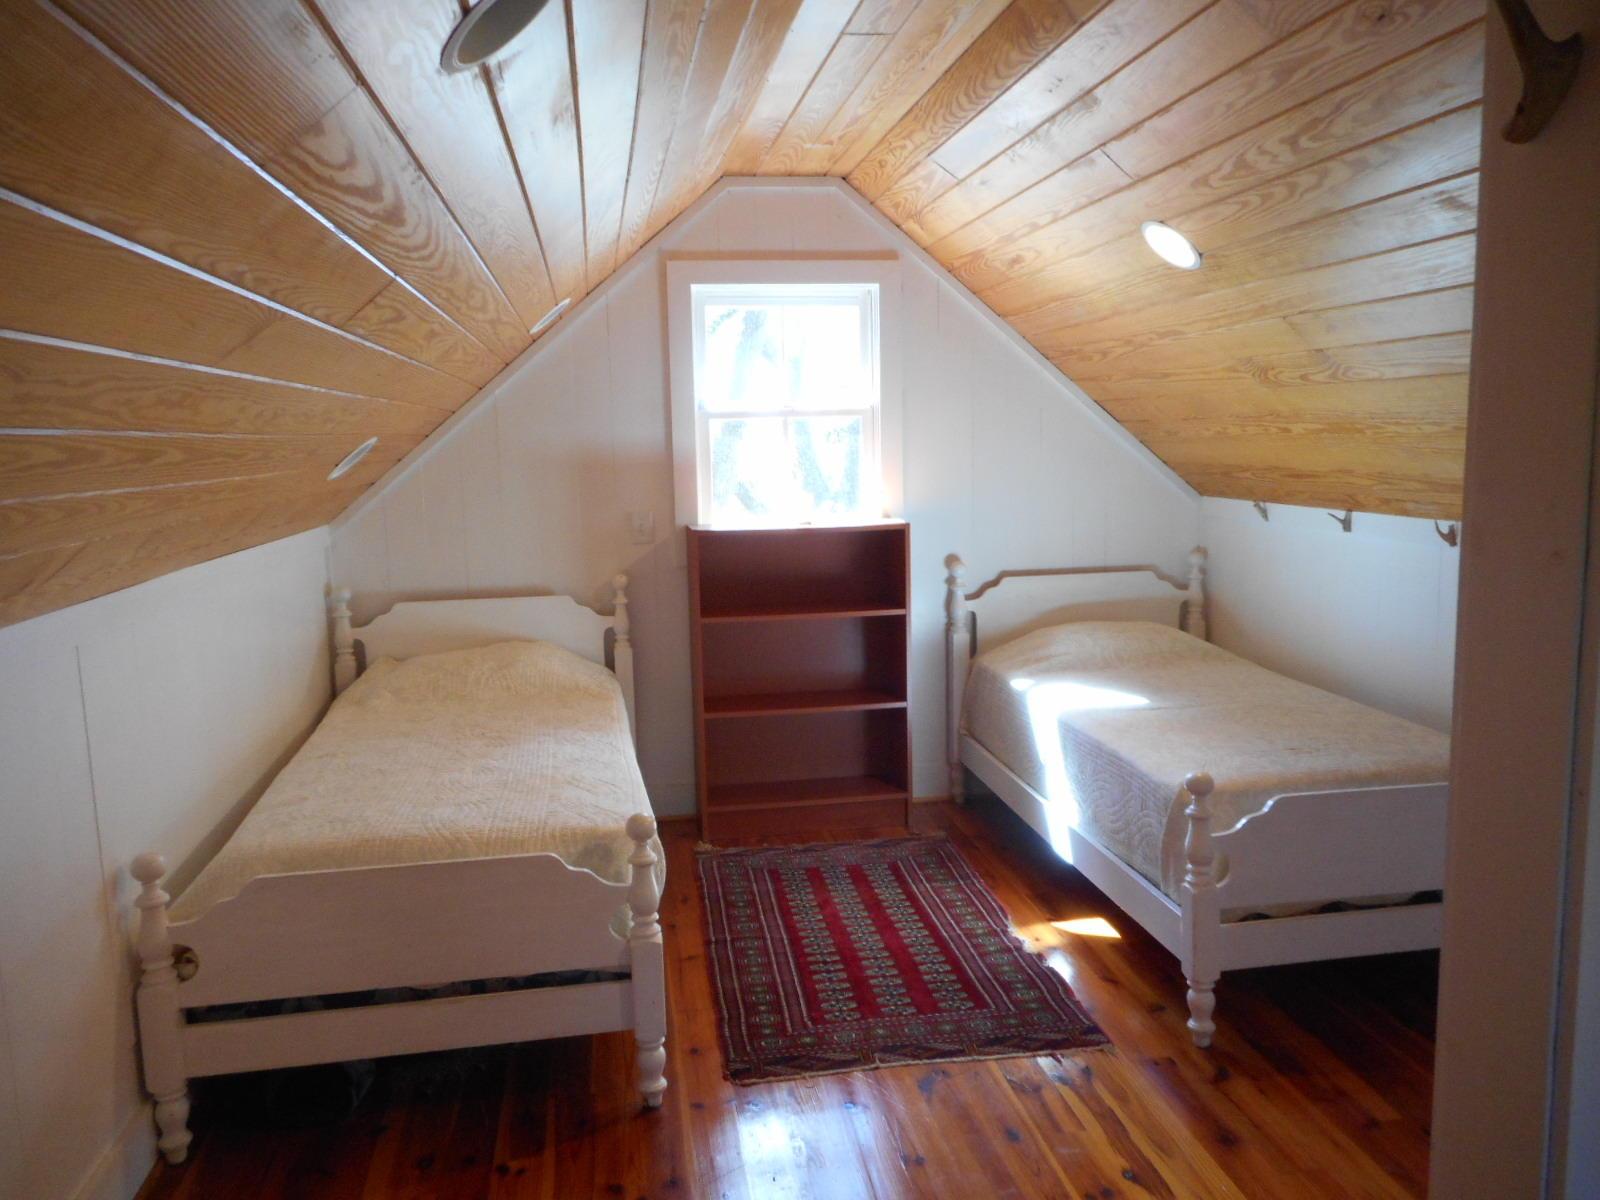 Bailey Island Club Homes For Sale - 2145 Bailey Island, Edisto Island, SC - 36